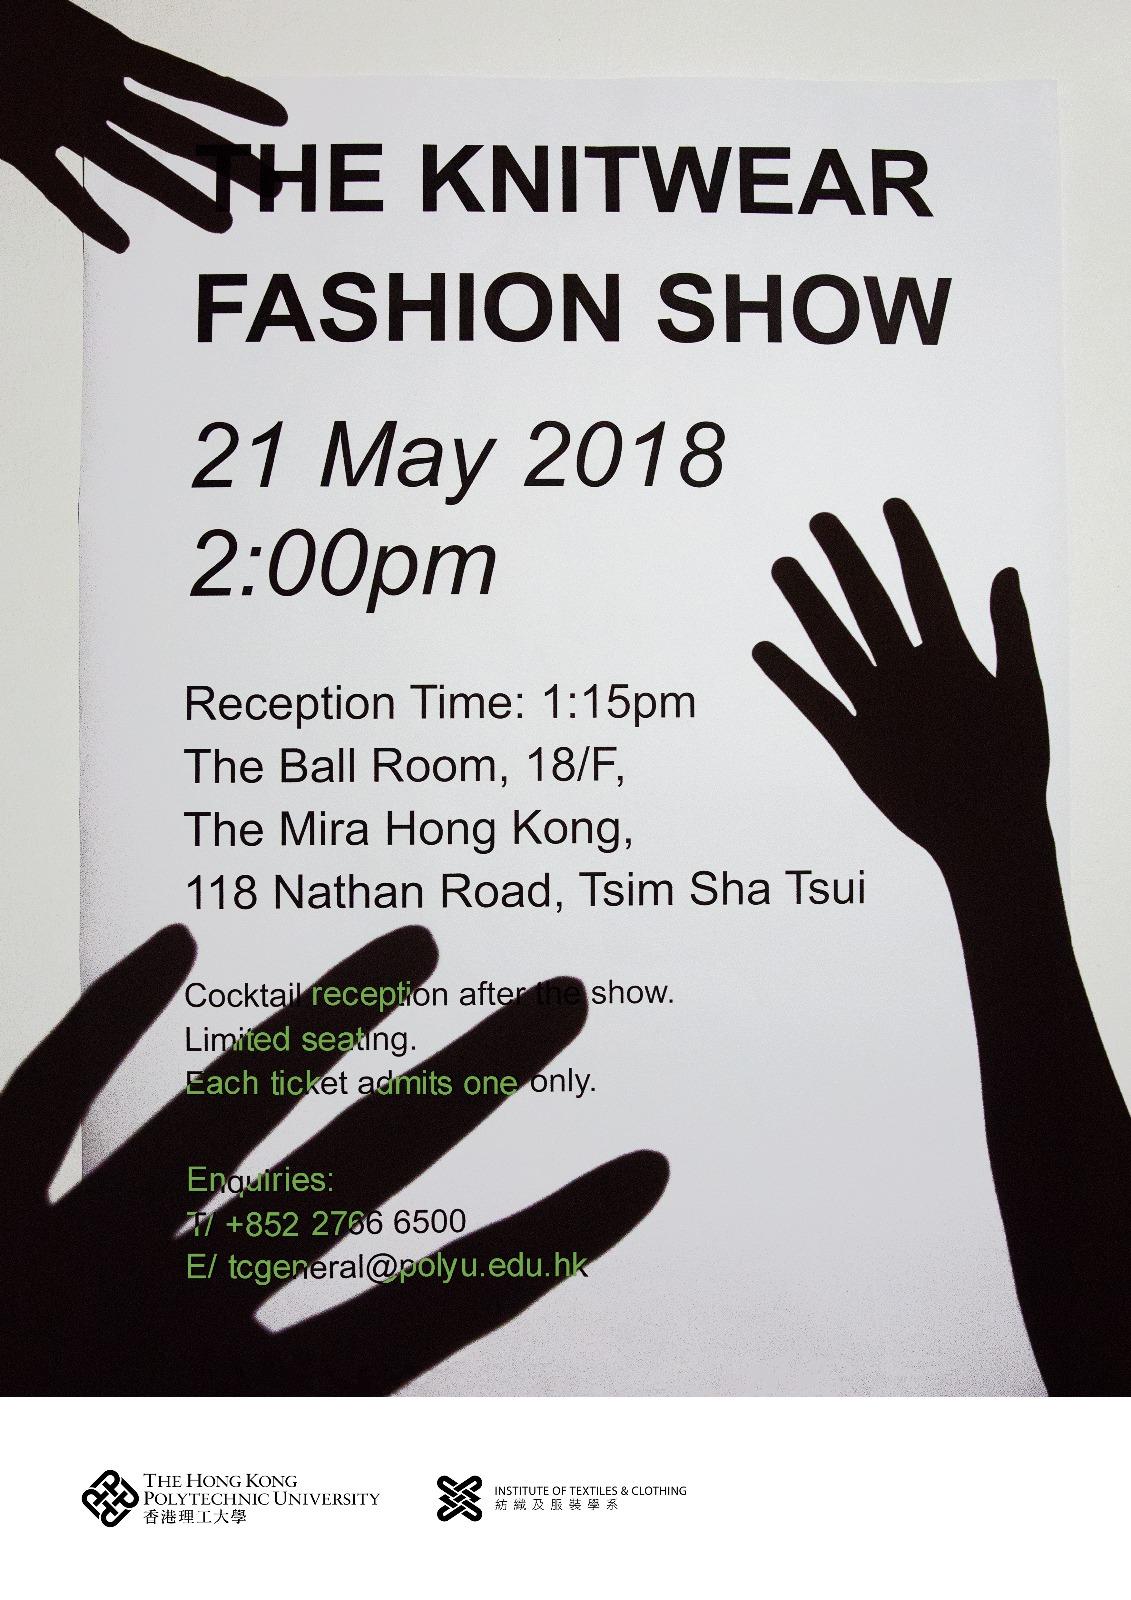 The Knitwear Fashion Show 2018